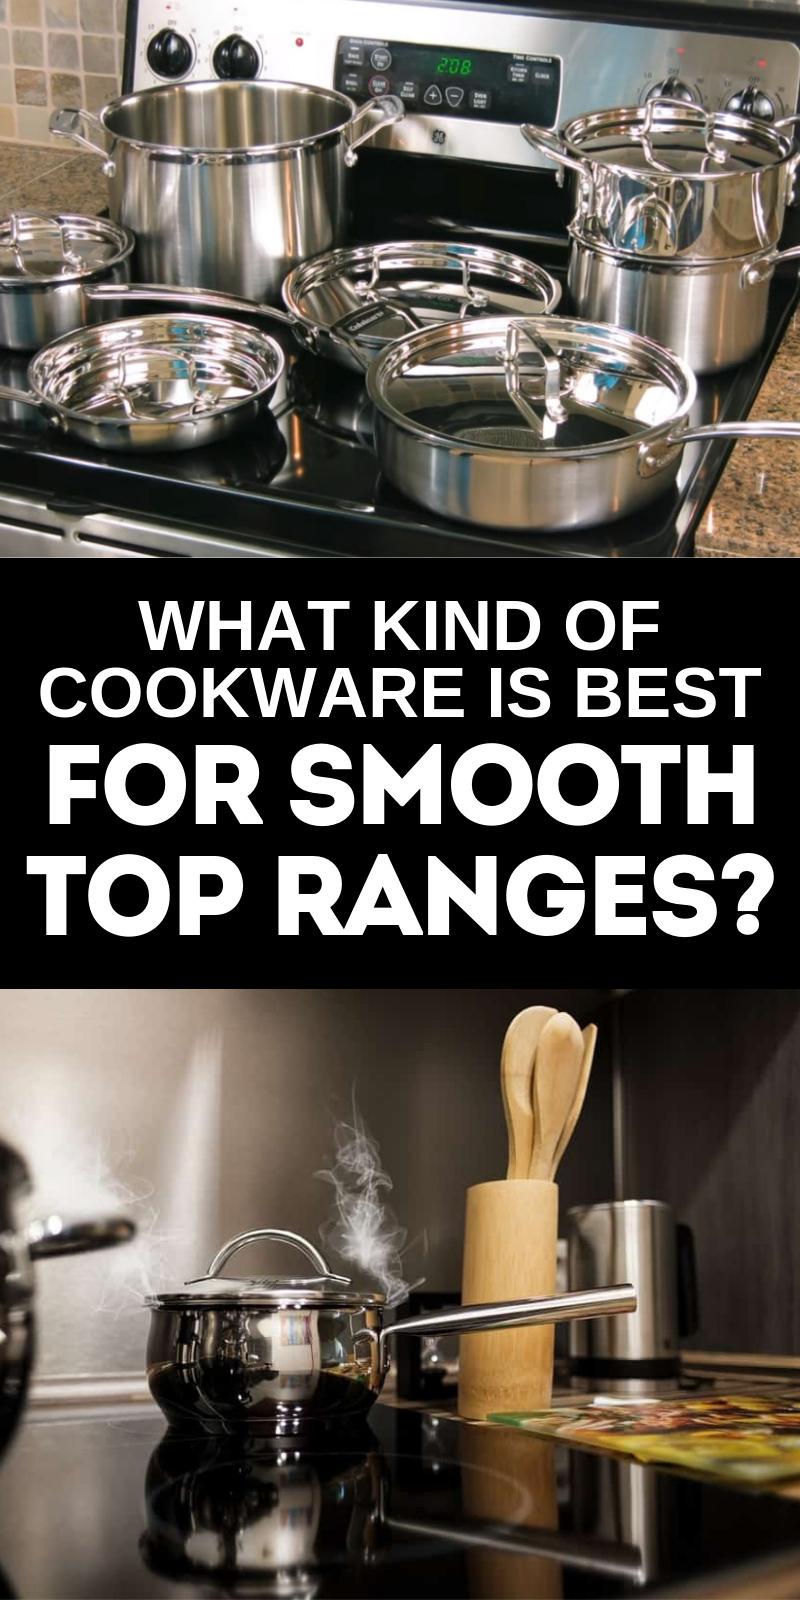 Cookware Set Or Single Piece